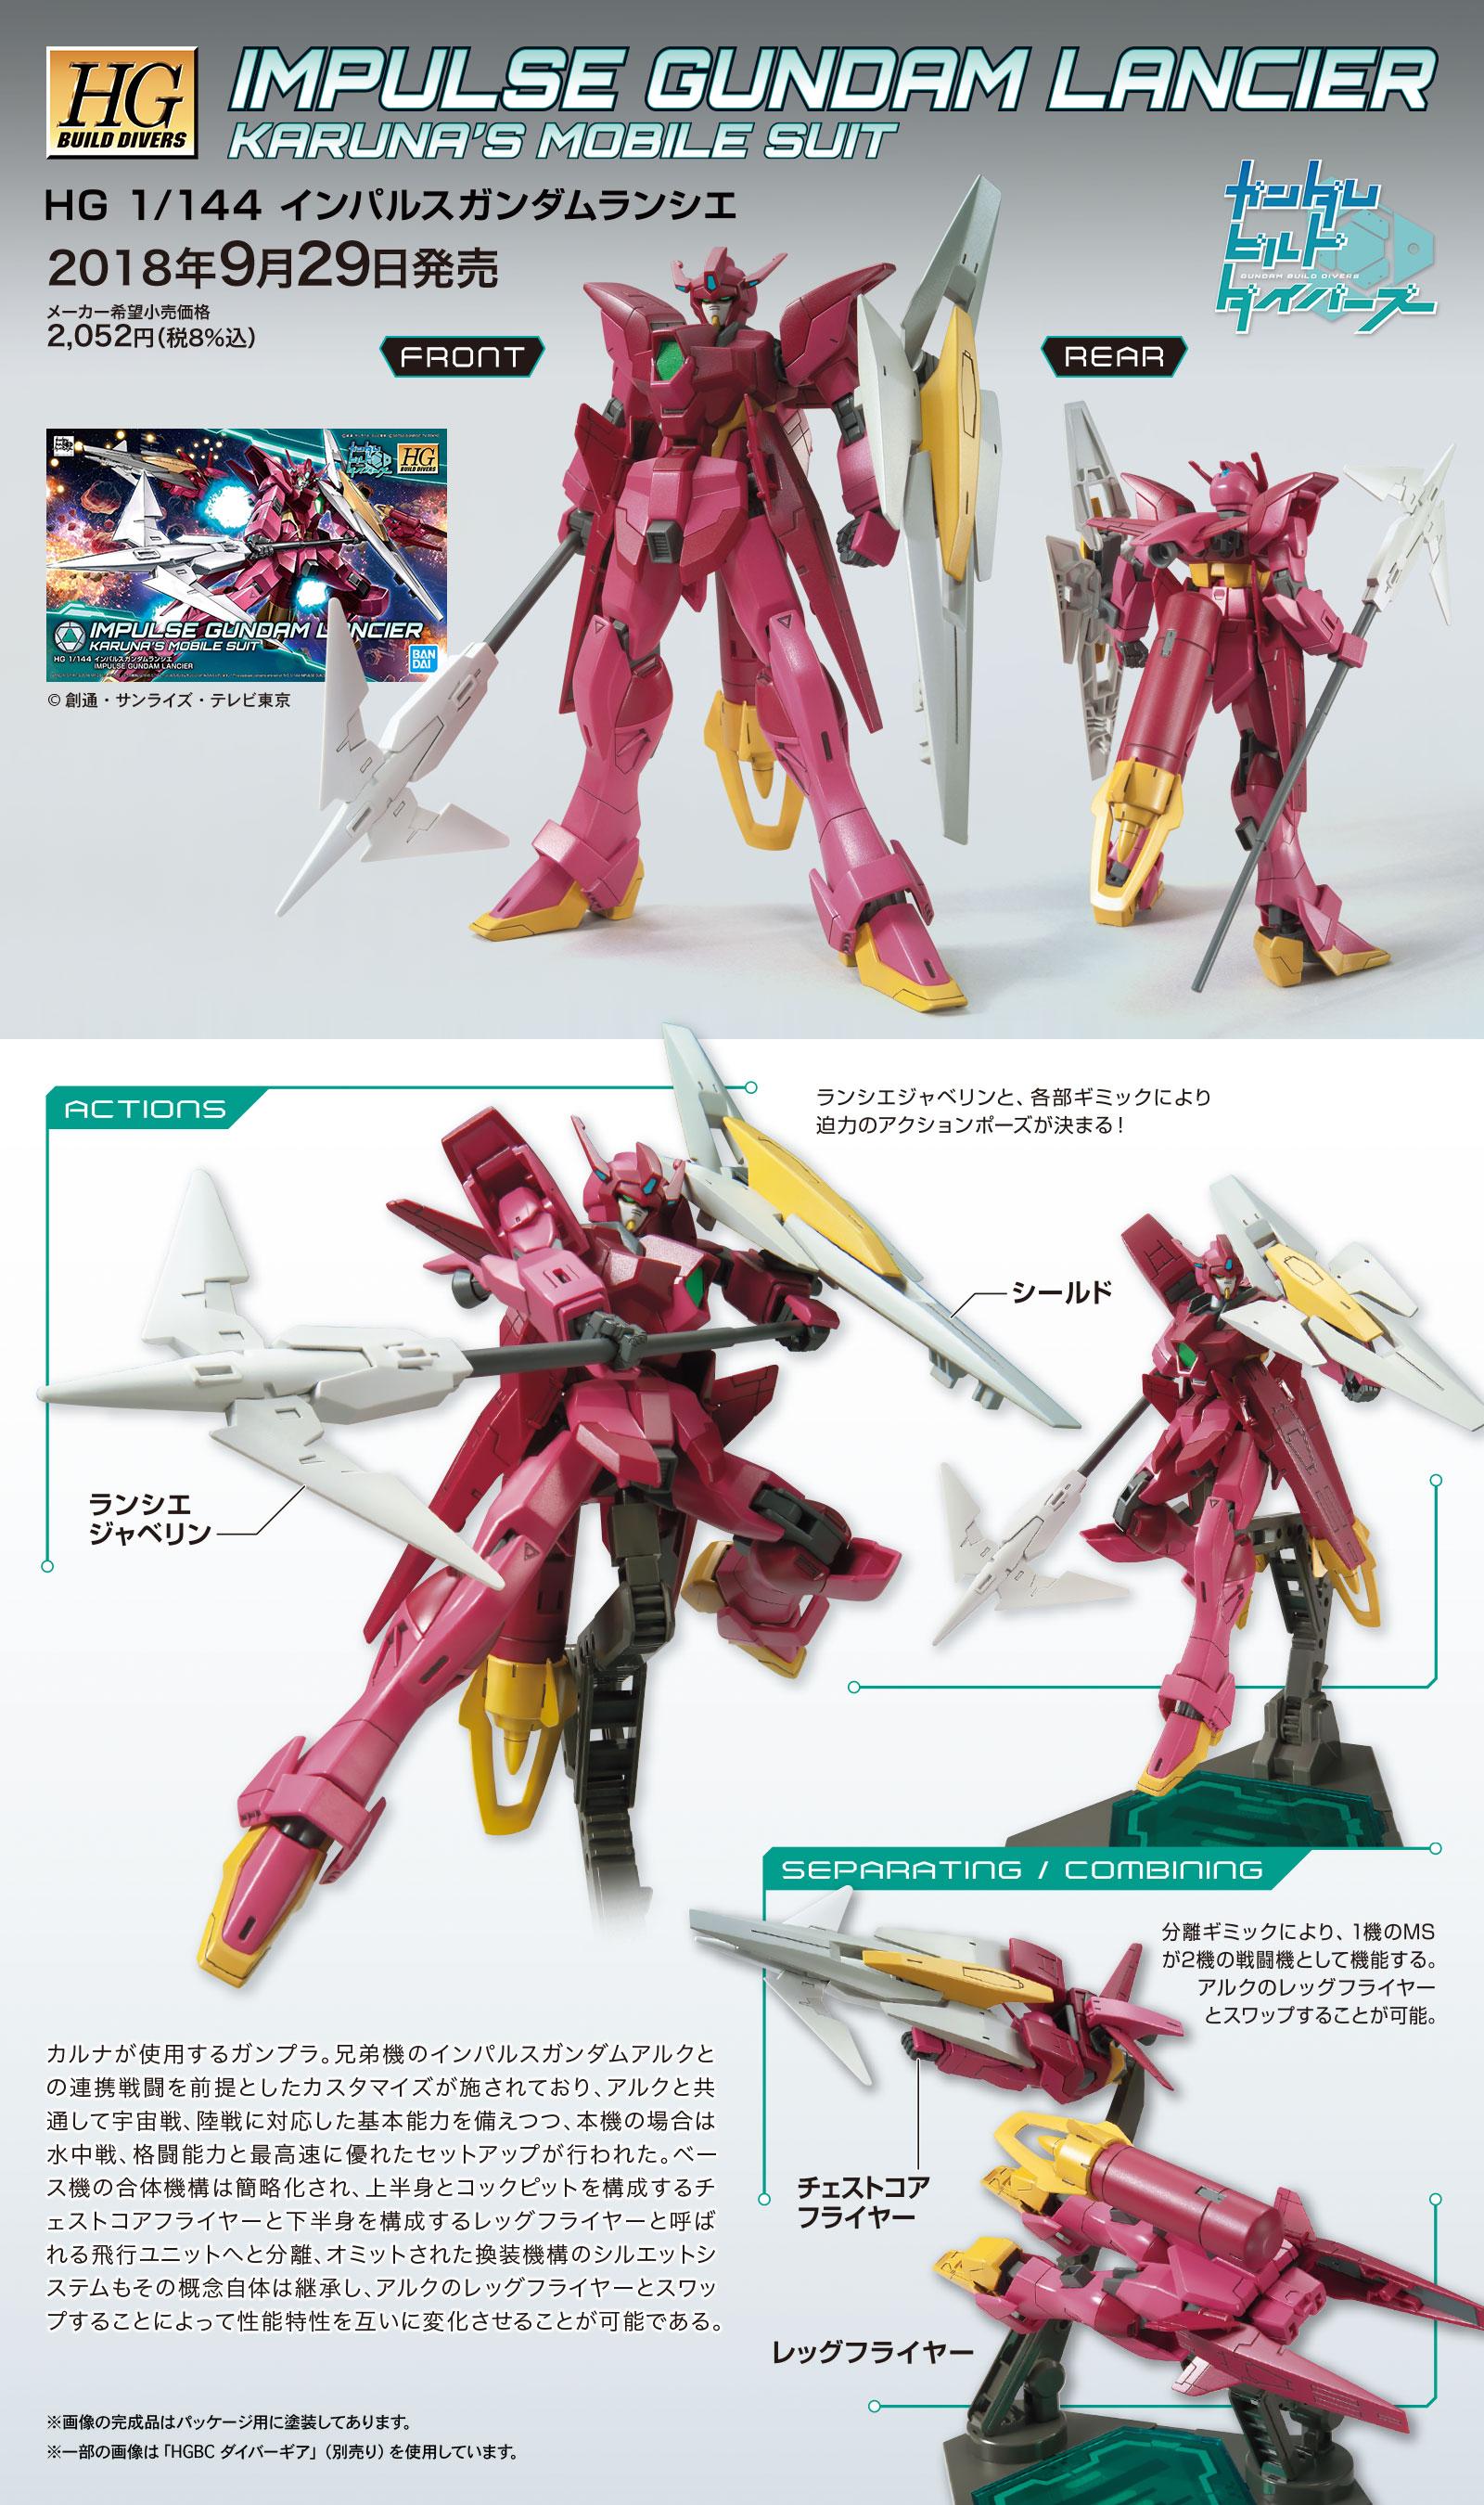 HGBD 1/144 インパルスガンダムランシエ [Impulse Gundam Lancier] 公式商品説明(画像)